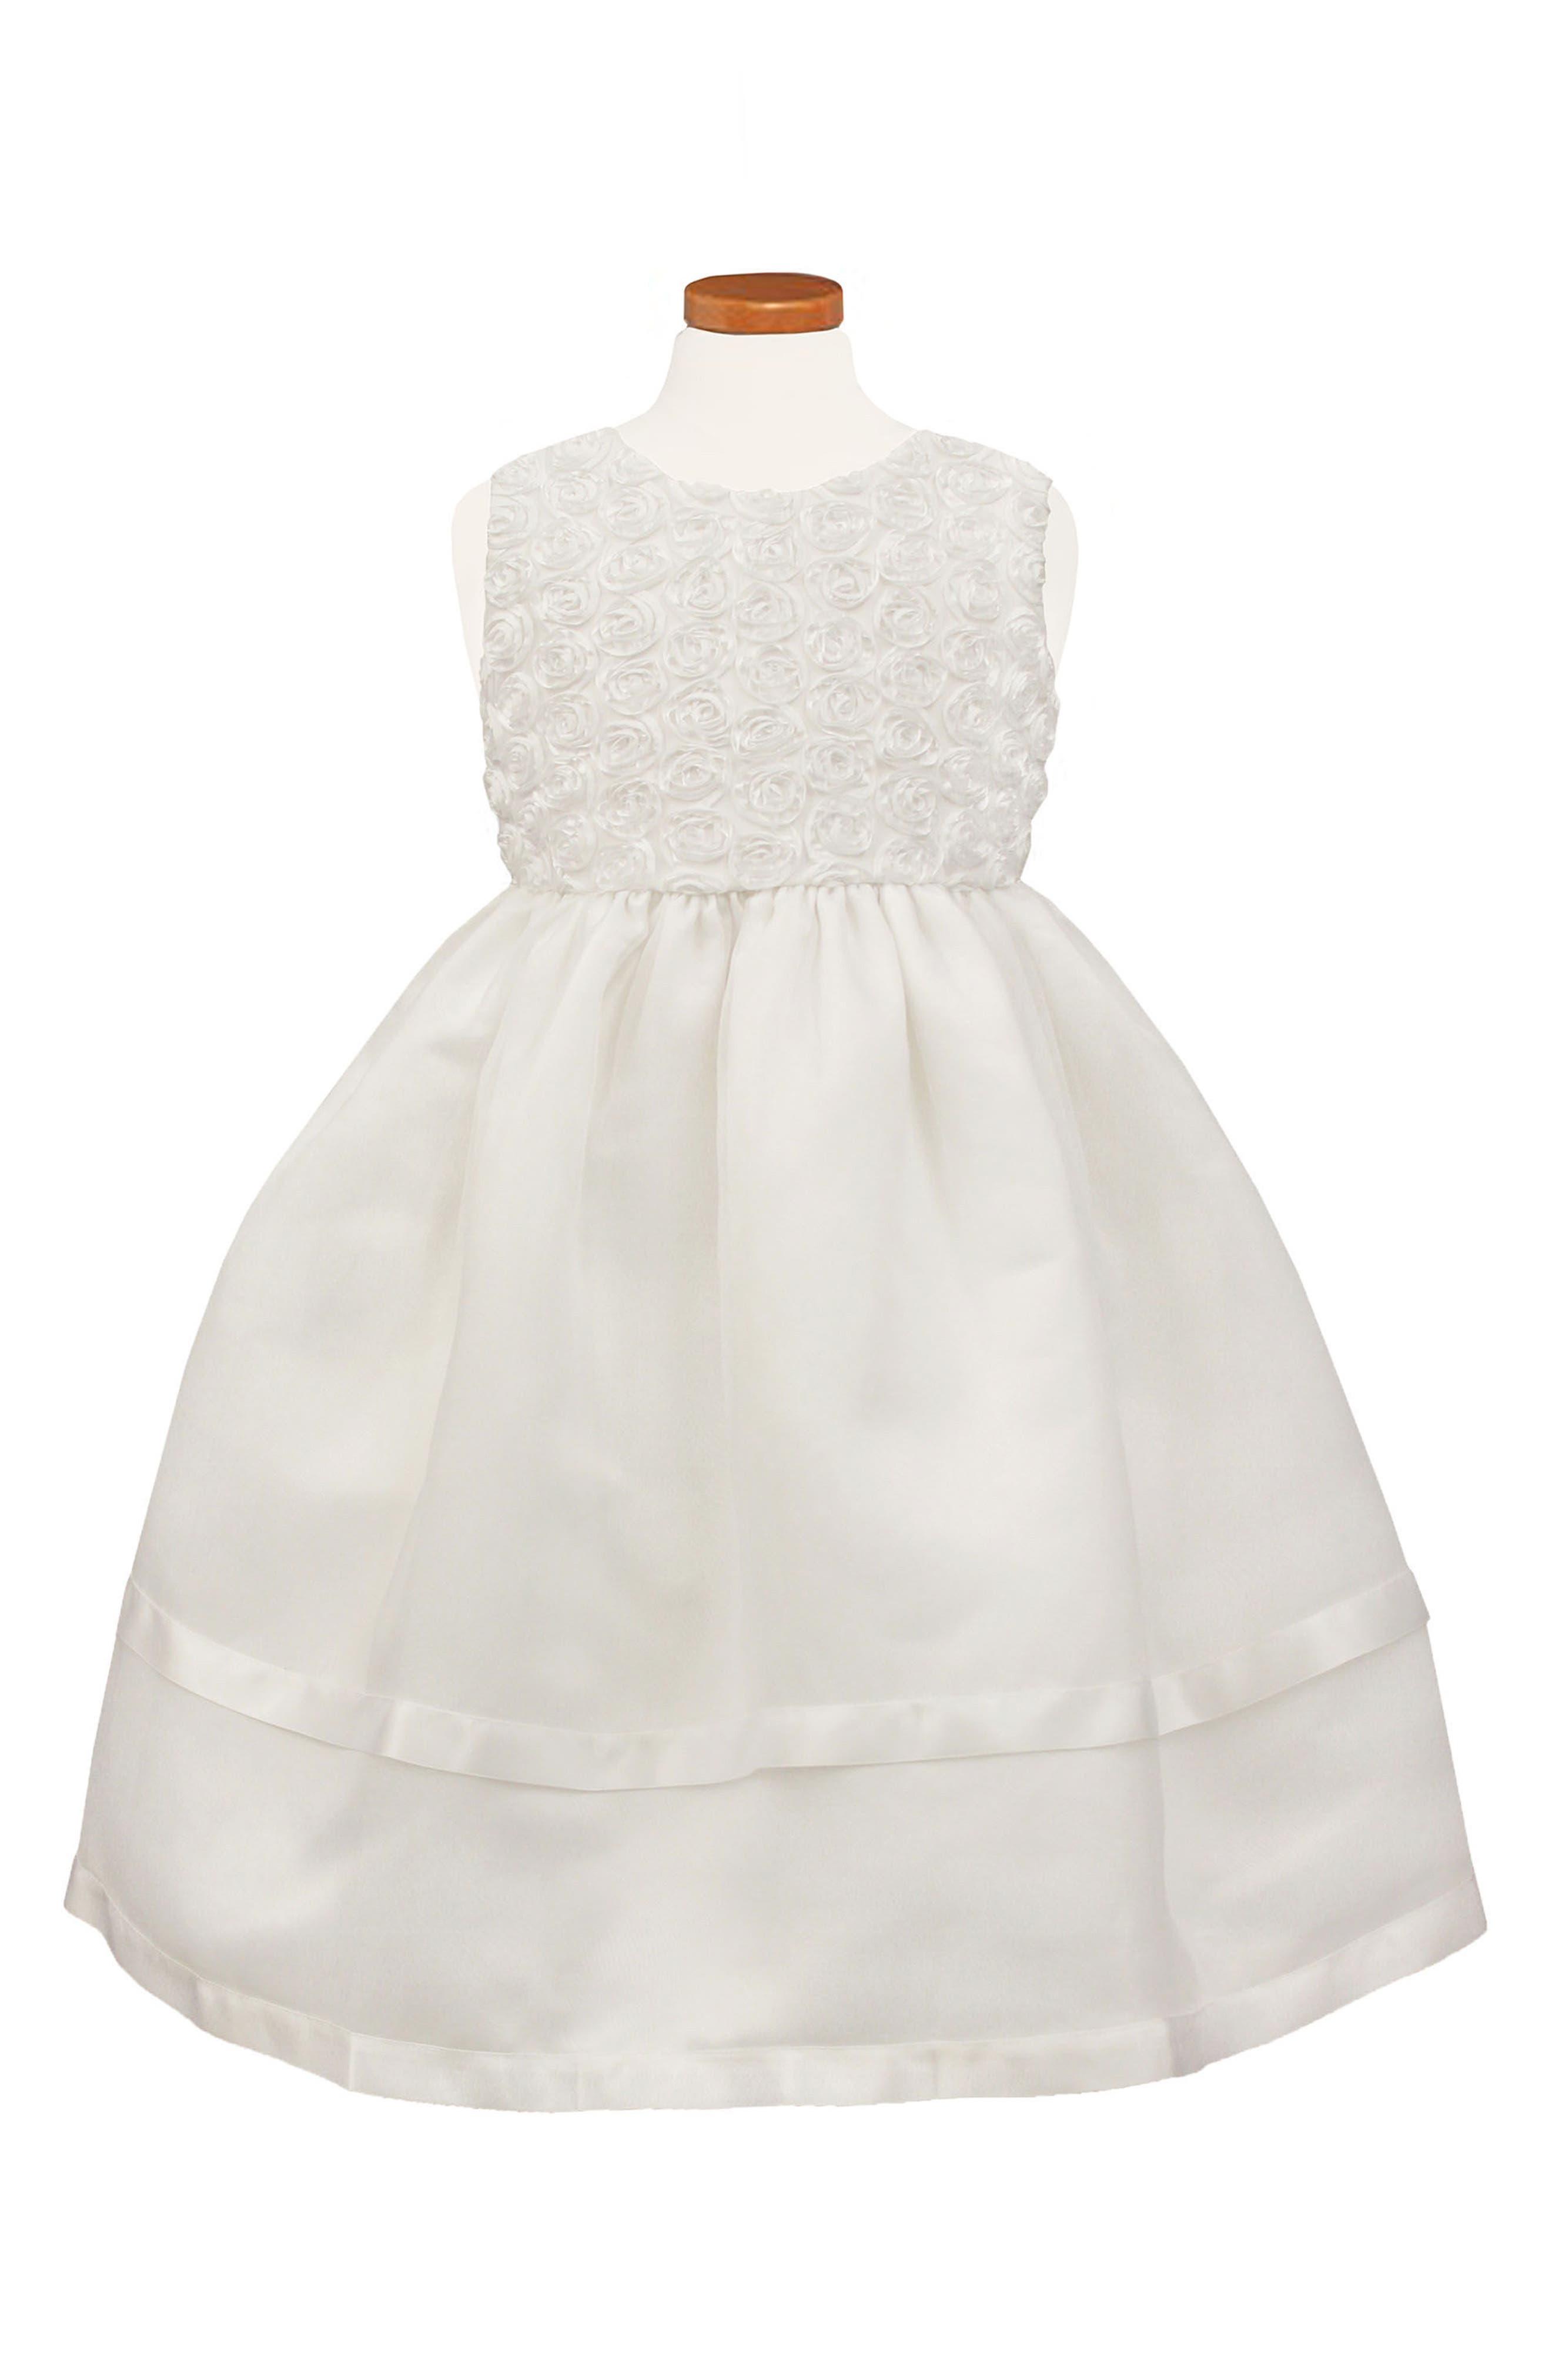 Main Image - Sorbet Sleeveless Organza Dress (Toddler Girls & Little Girls)